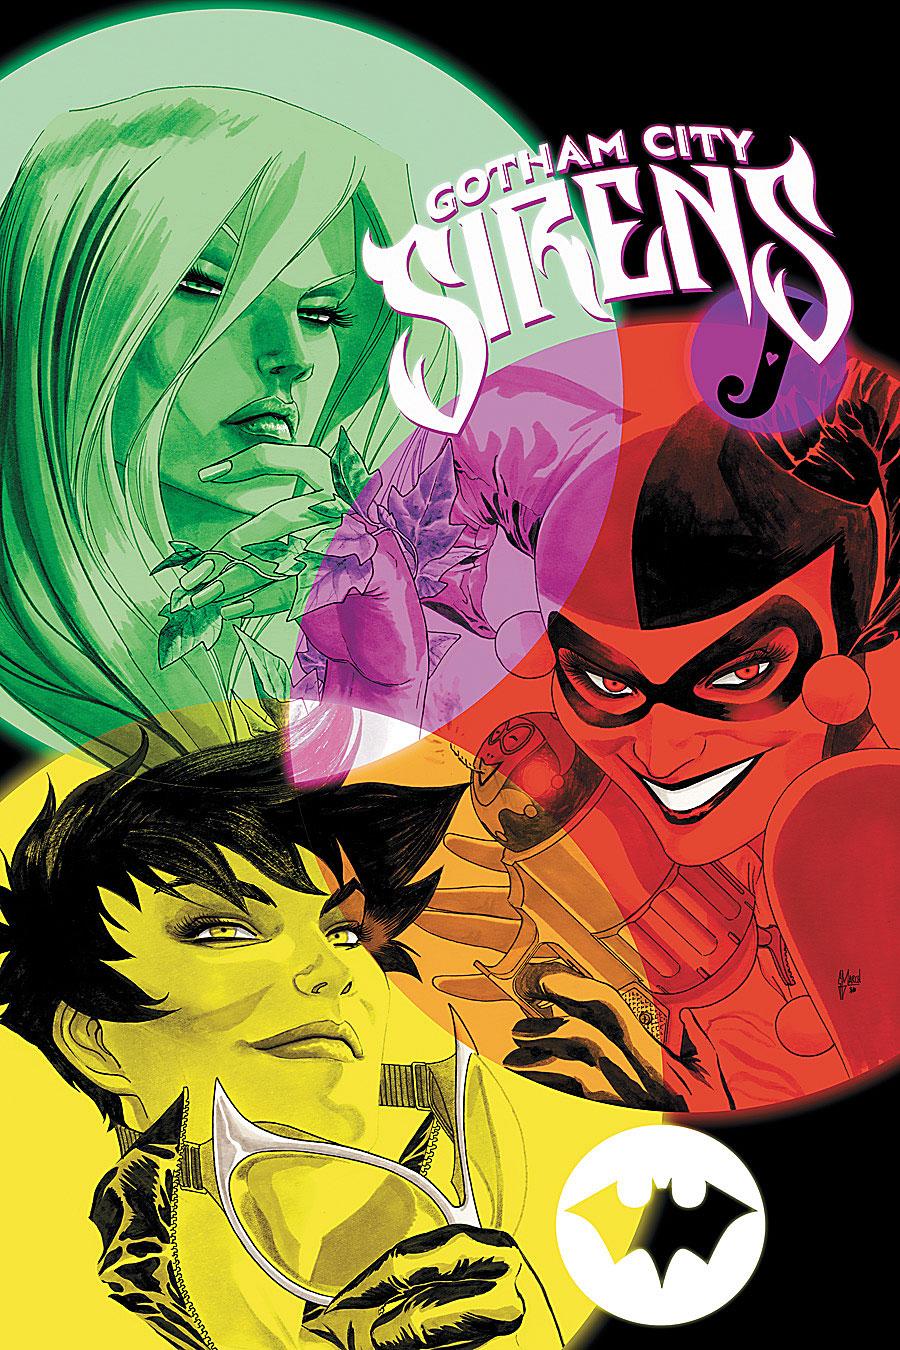 Gotham City Sirens Vol 1 14 Textless.jpg